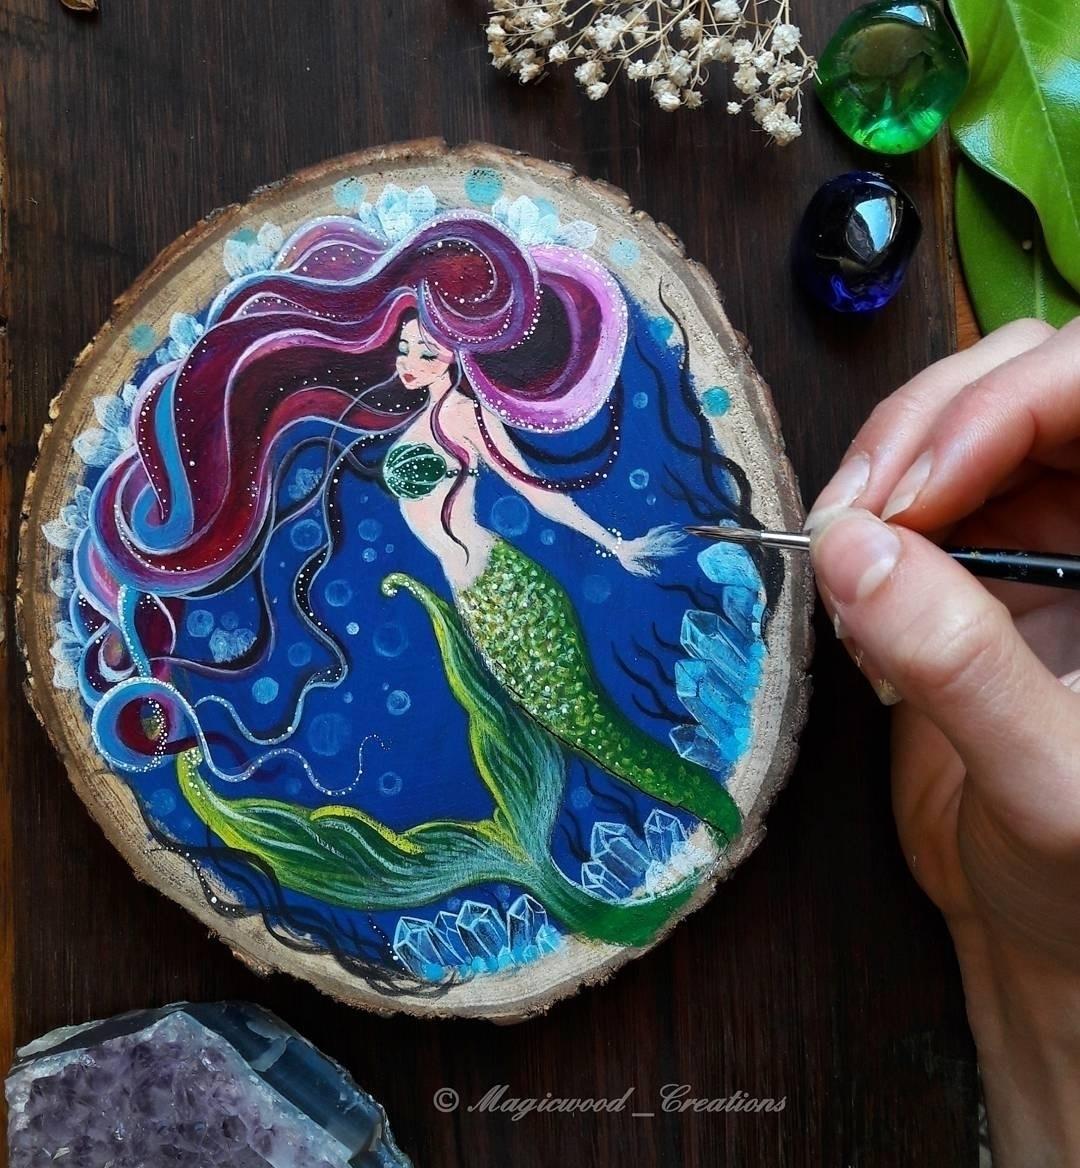 Work progress - mermaid, mermaidlovers - magicwood_creations | ello